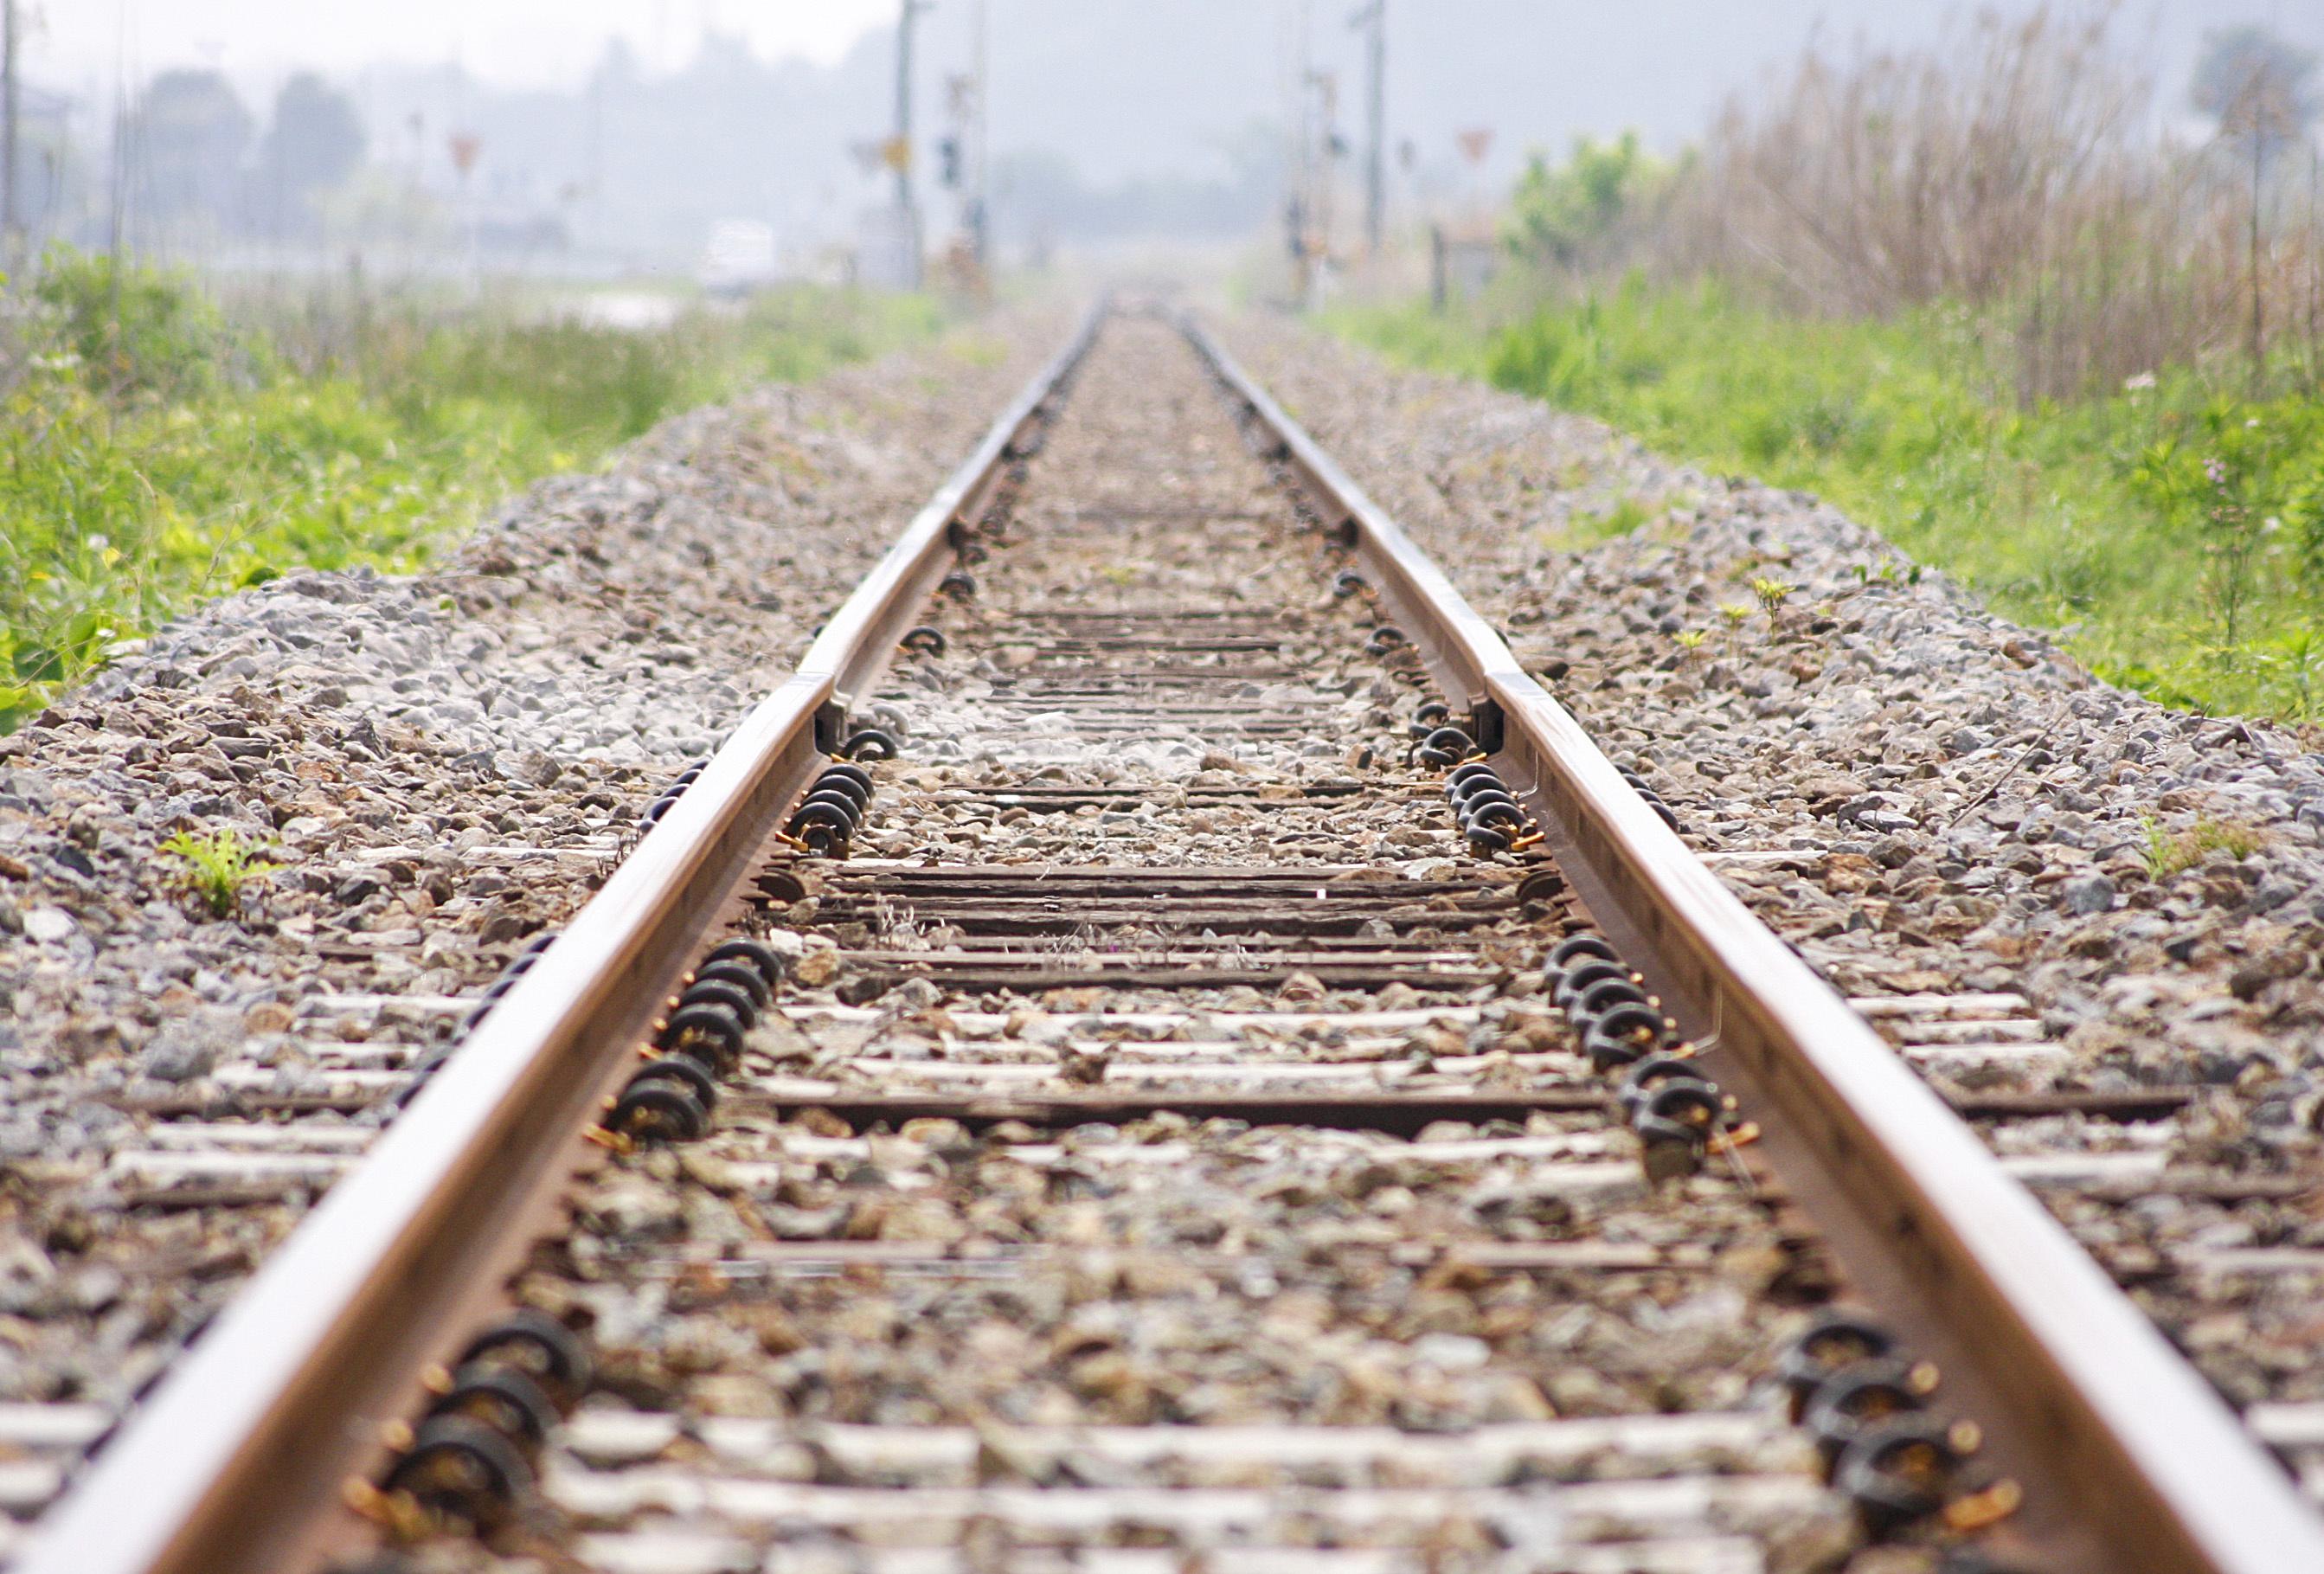 https://assets.sourcemedia.com/35/59/2fad20134c69a9c4207911d04eb0/rail-lines-71464086-adobe.jpg